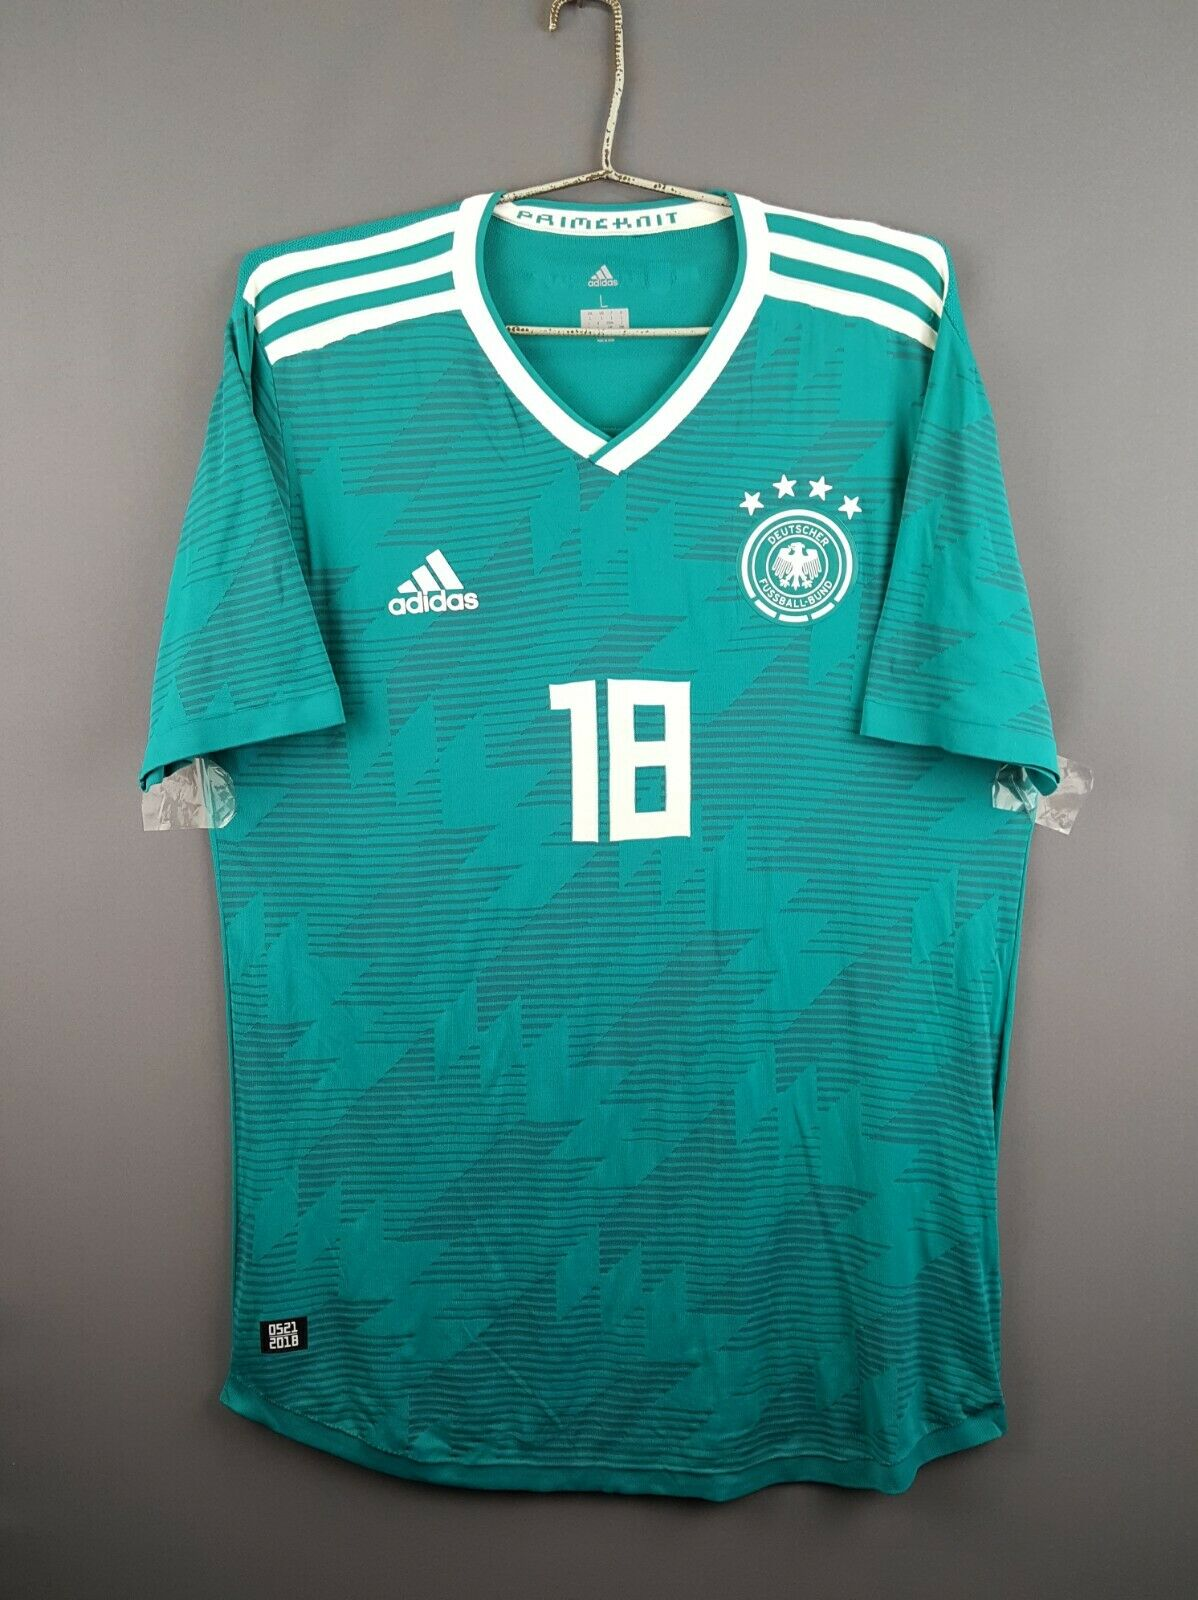 5 5 Adidas Duitsland voetbalshirt grote 2019 away shirt CE8440 football ig93